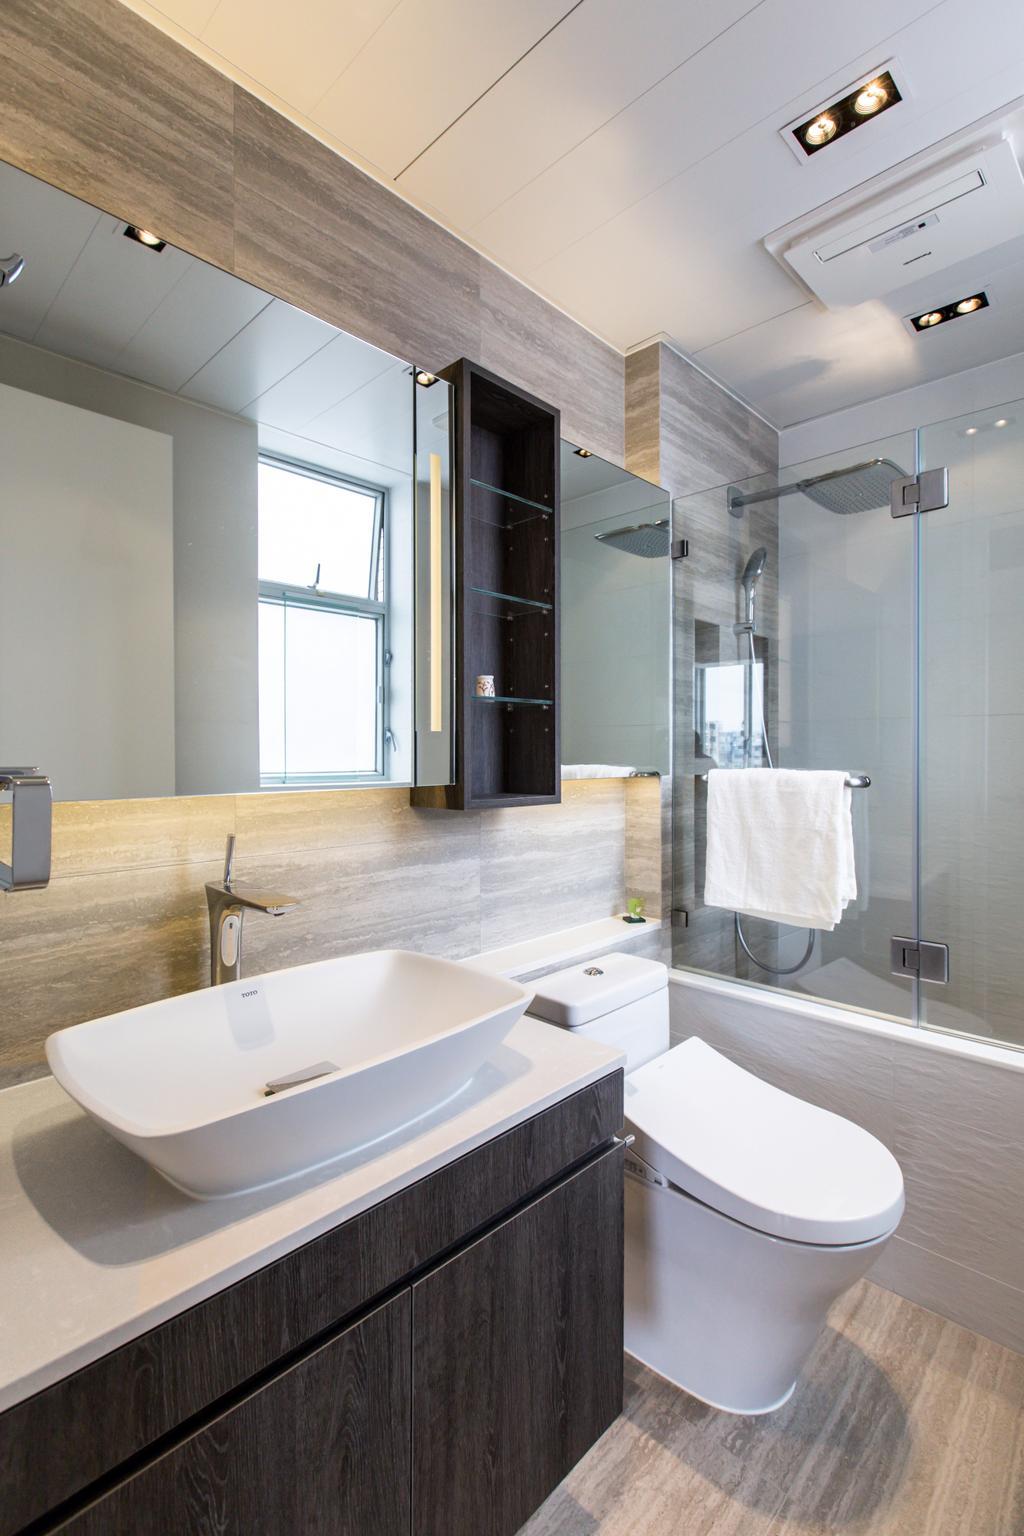 摩登, 私家樓, 浴室, 九龍塘, 室內設計師, O - Square Interior Design, 簡約